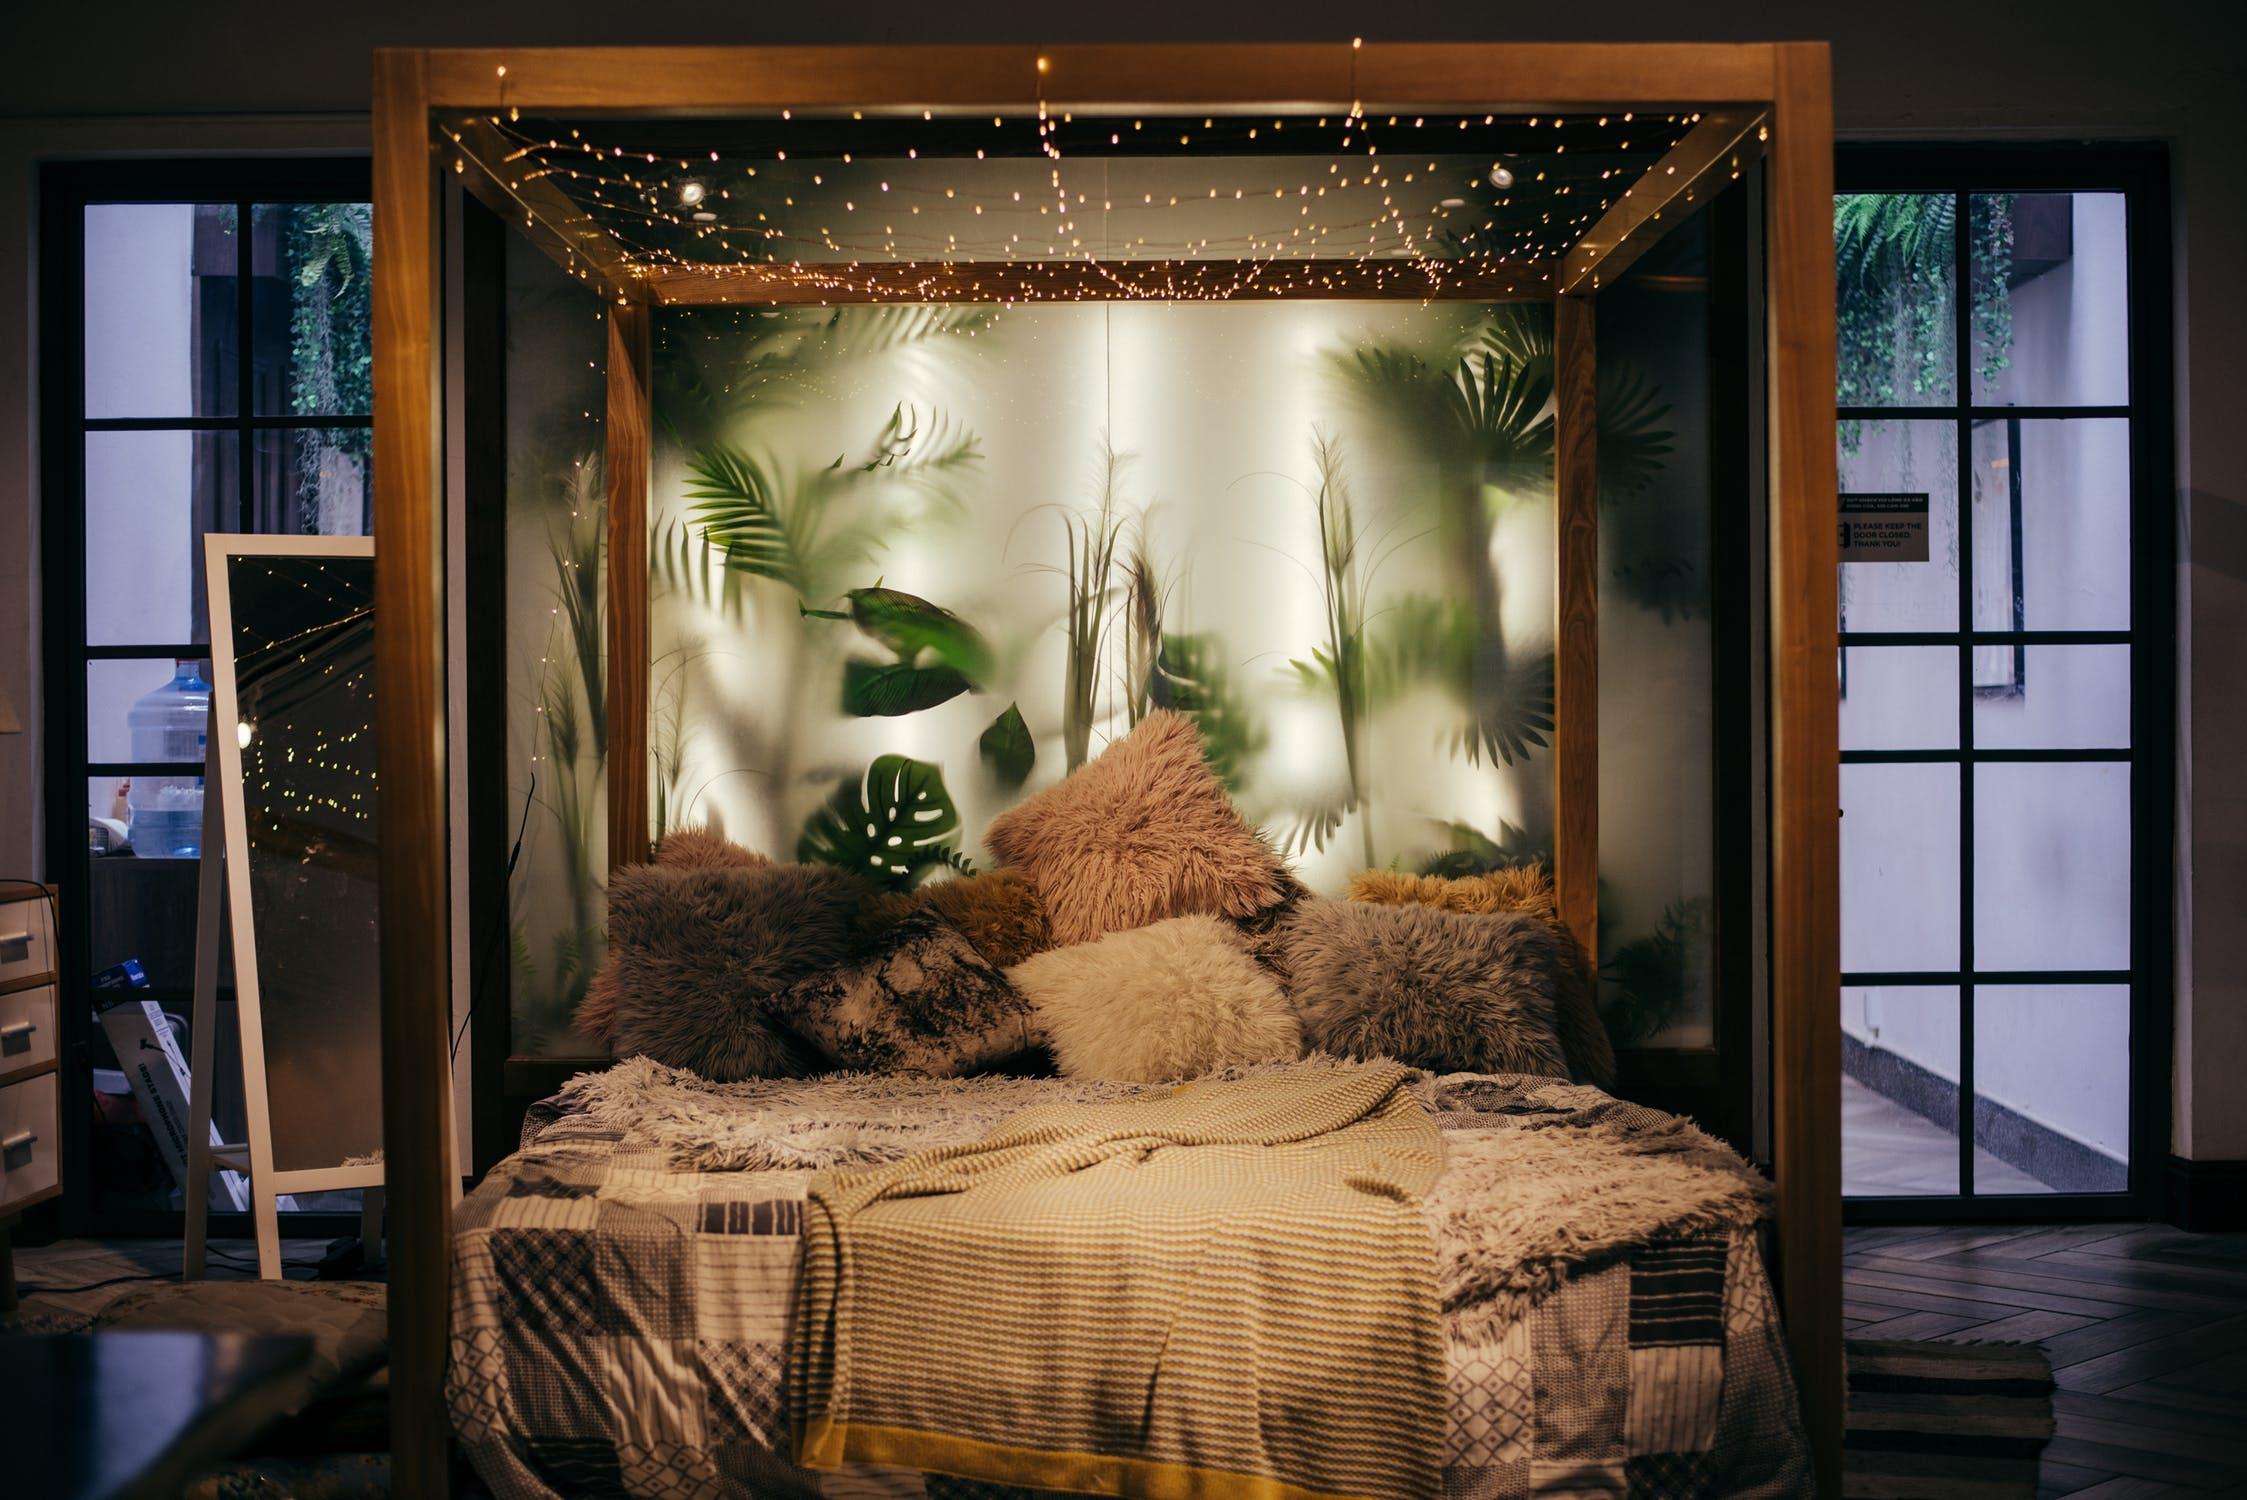 6 Elegant Ideas To Perfect Bedroom Aesthetics - World ... on Room Decor Ideas De Cuartos Aesthetic id=25381